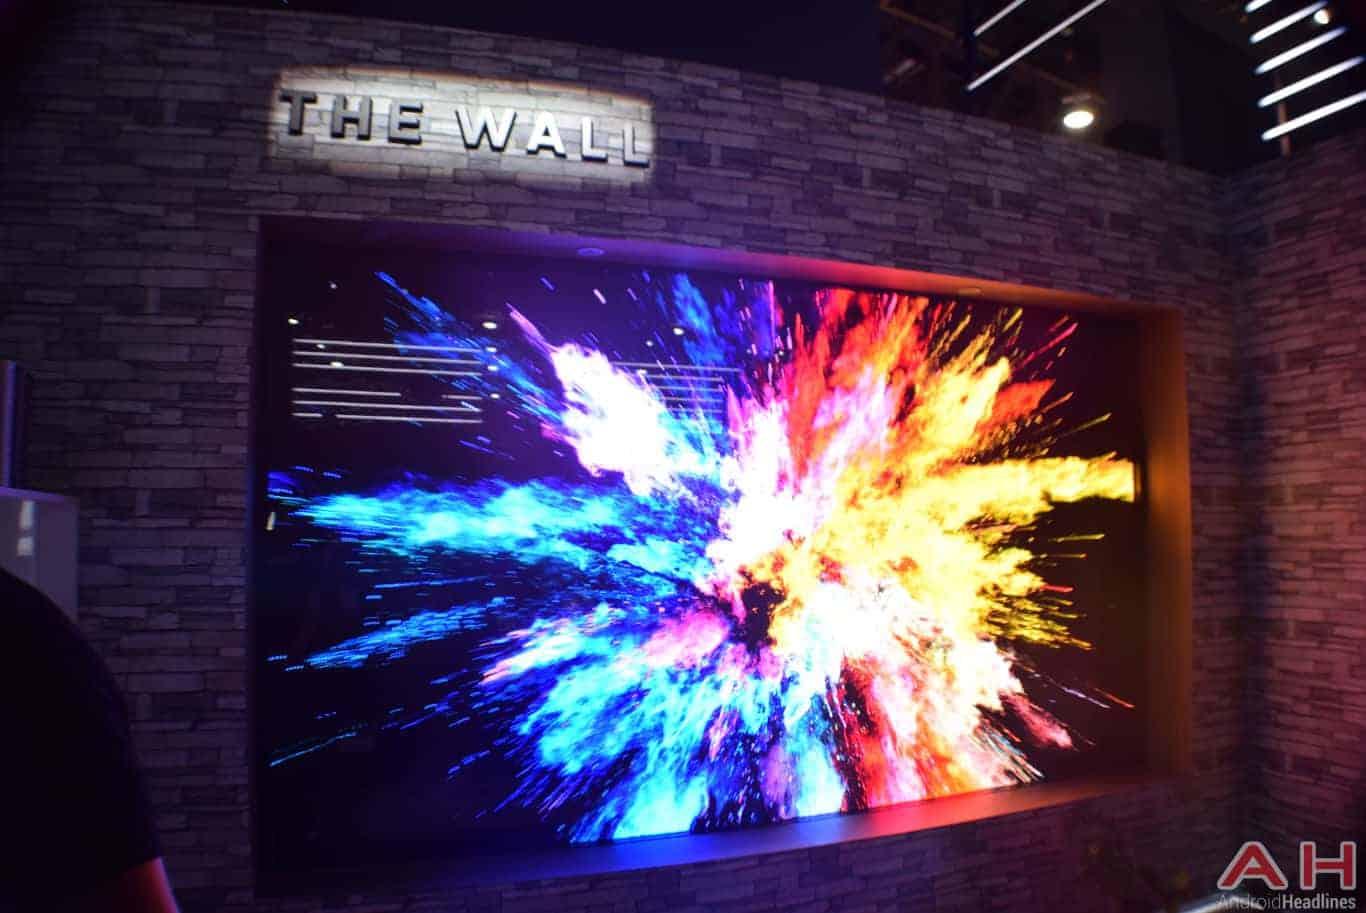 Samsung The Wall Modular MicroLED TV CES 2018 AH 4